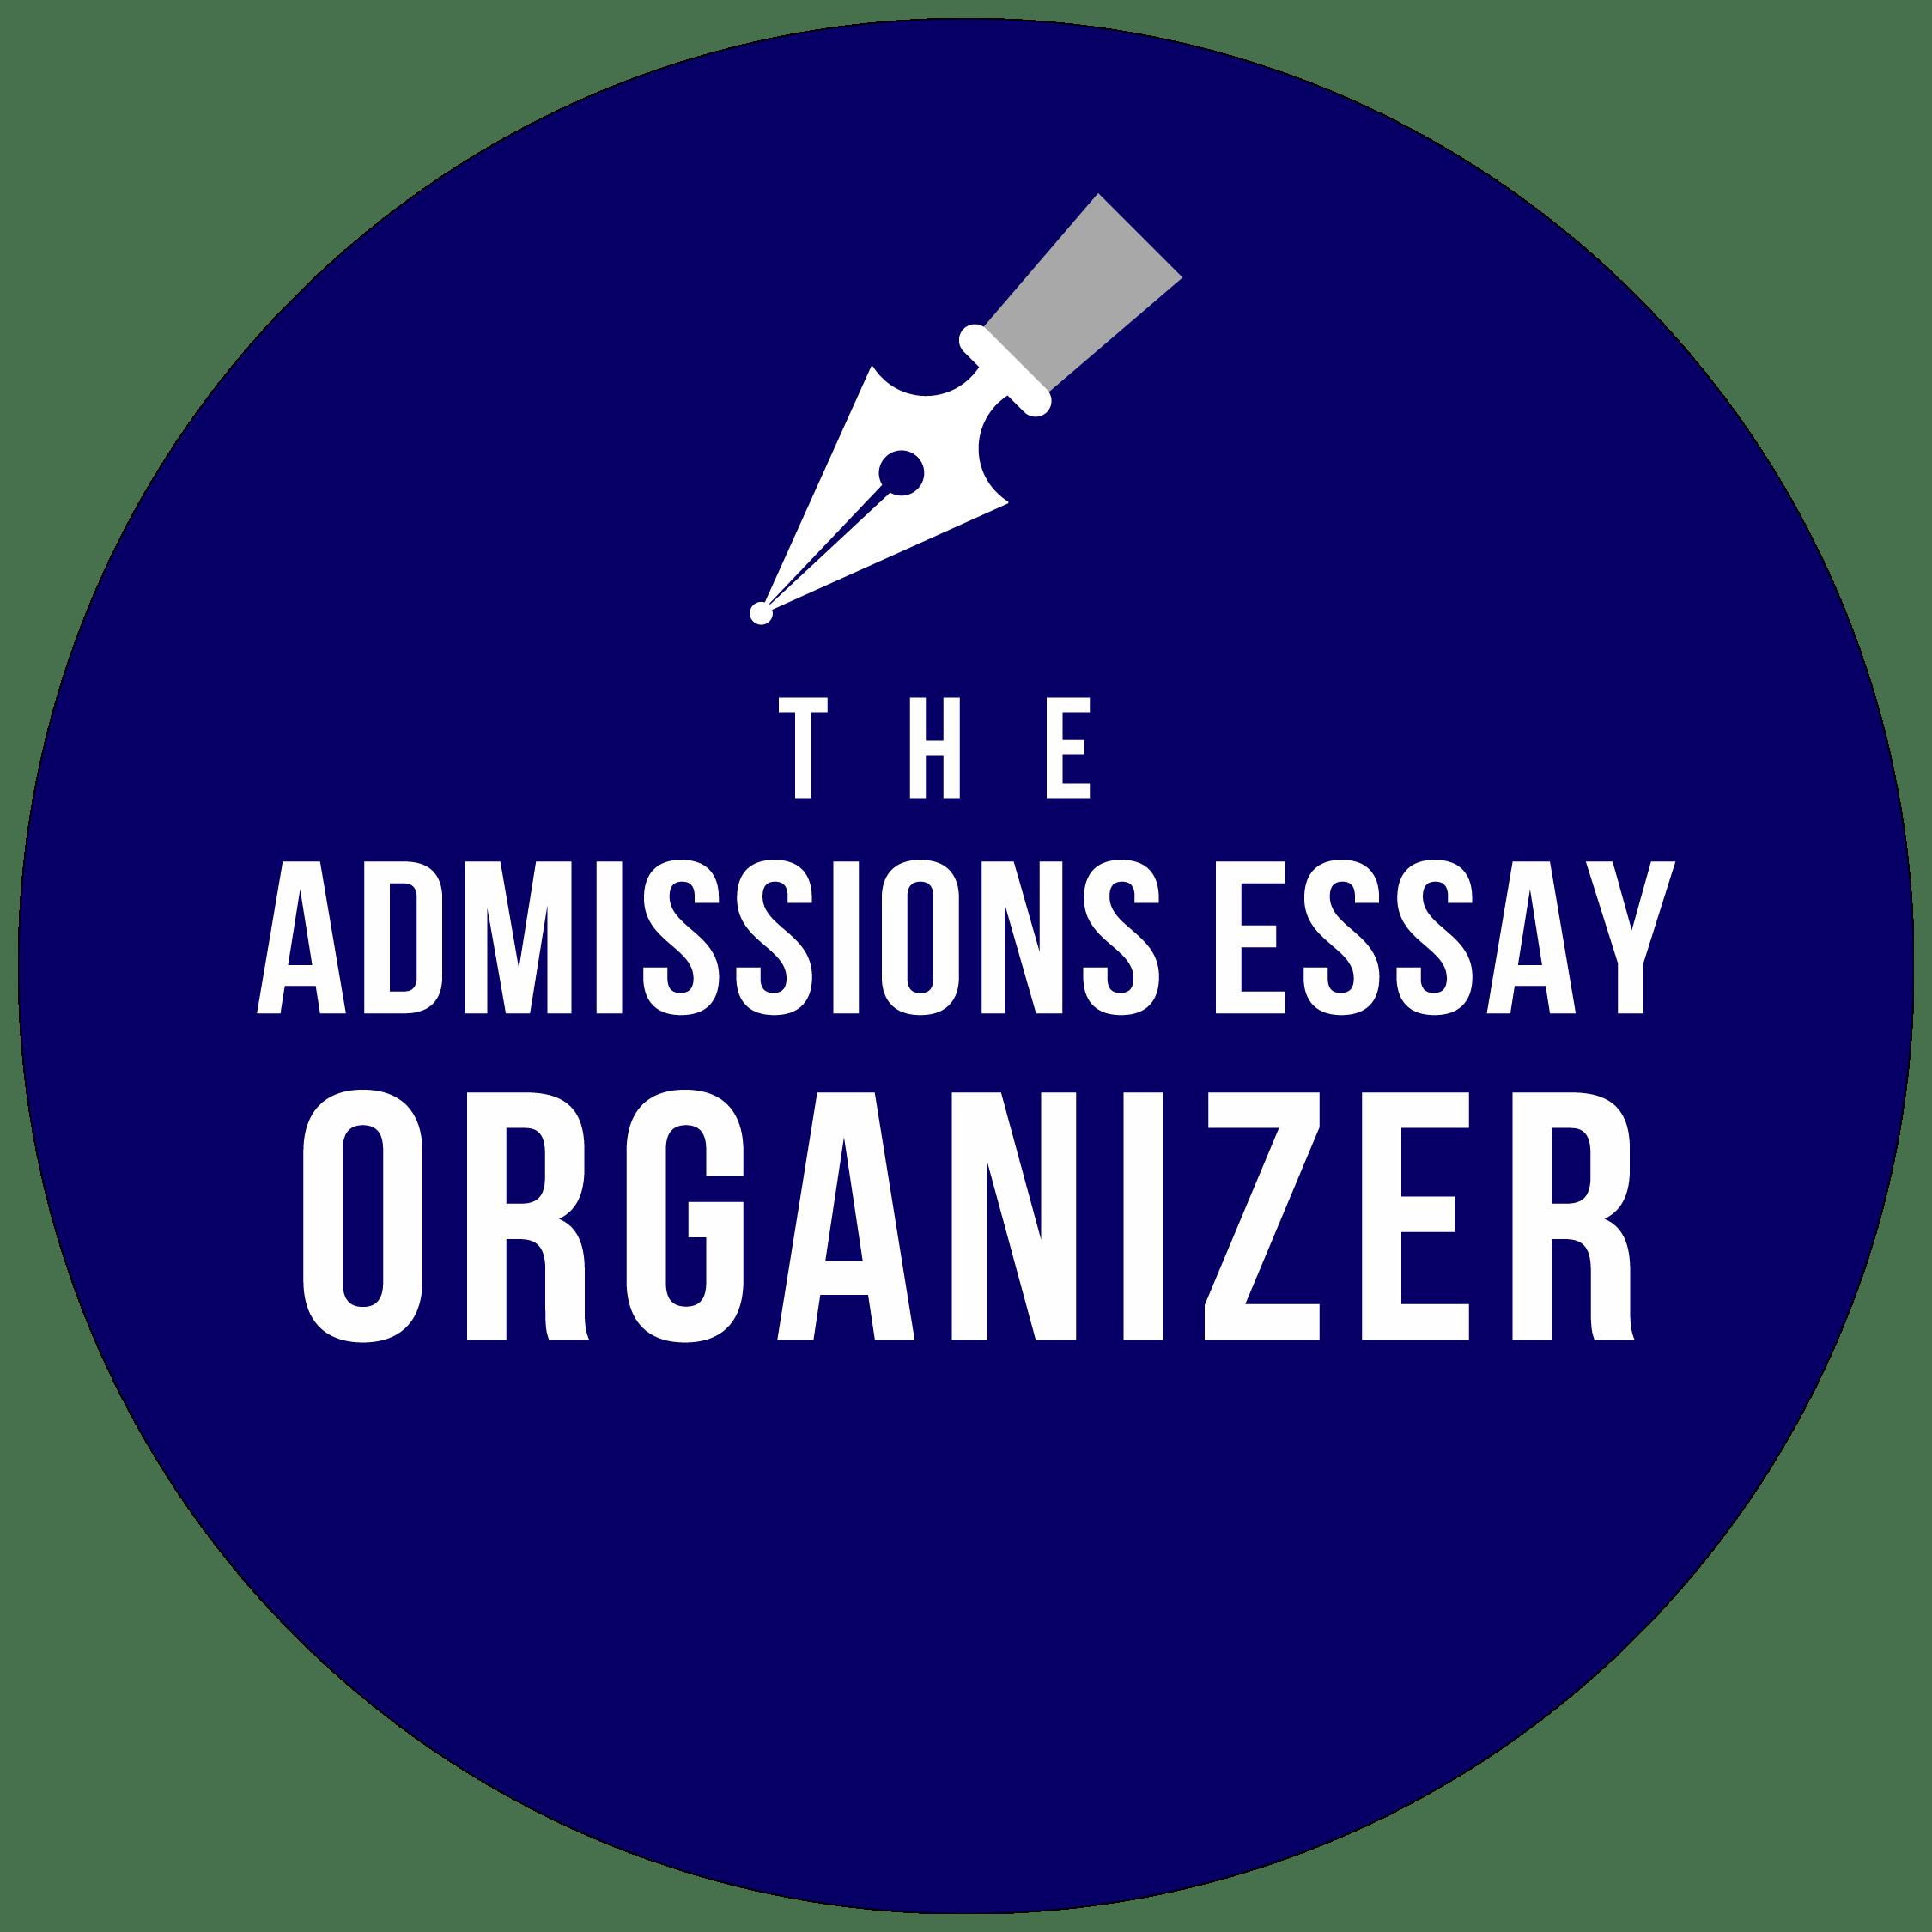 Esl essays editing service for school